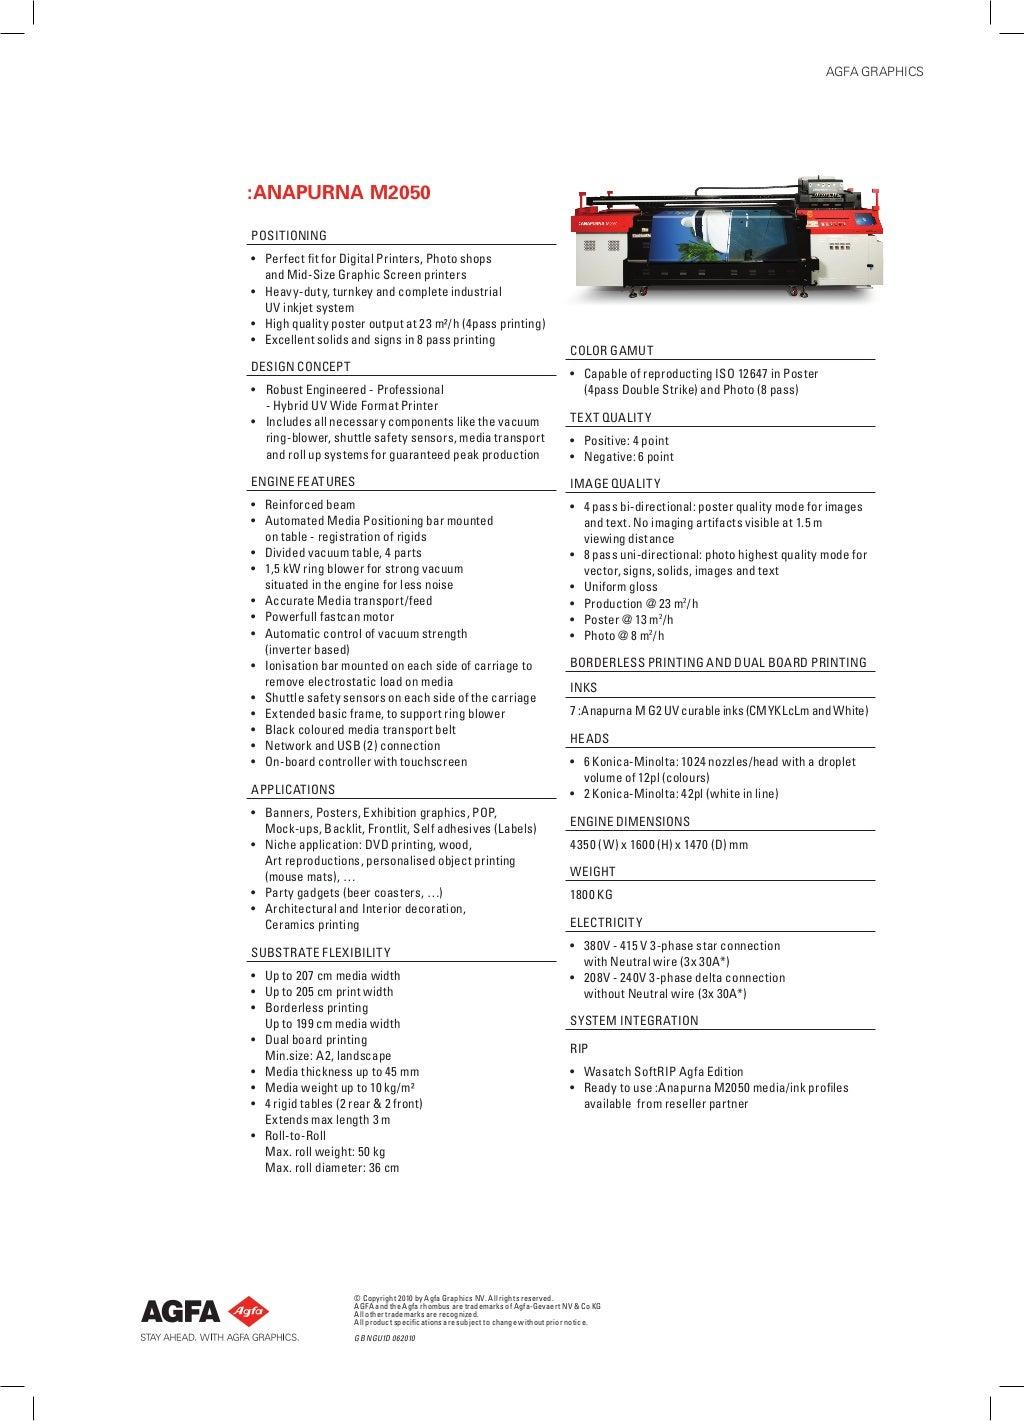 AGFA :Anapurna M2050 inkjet system